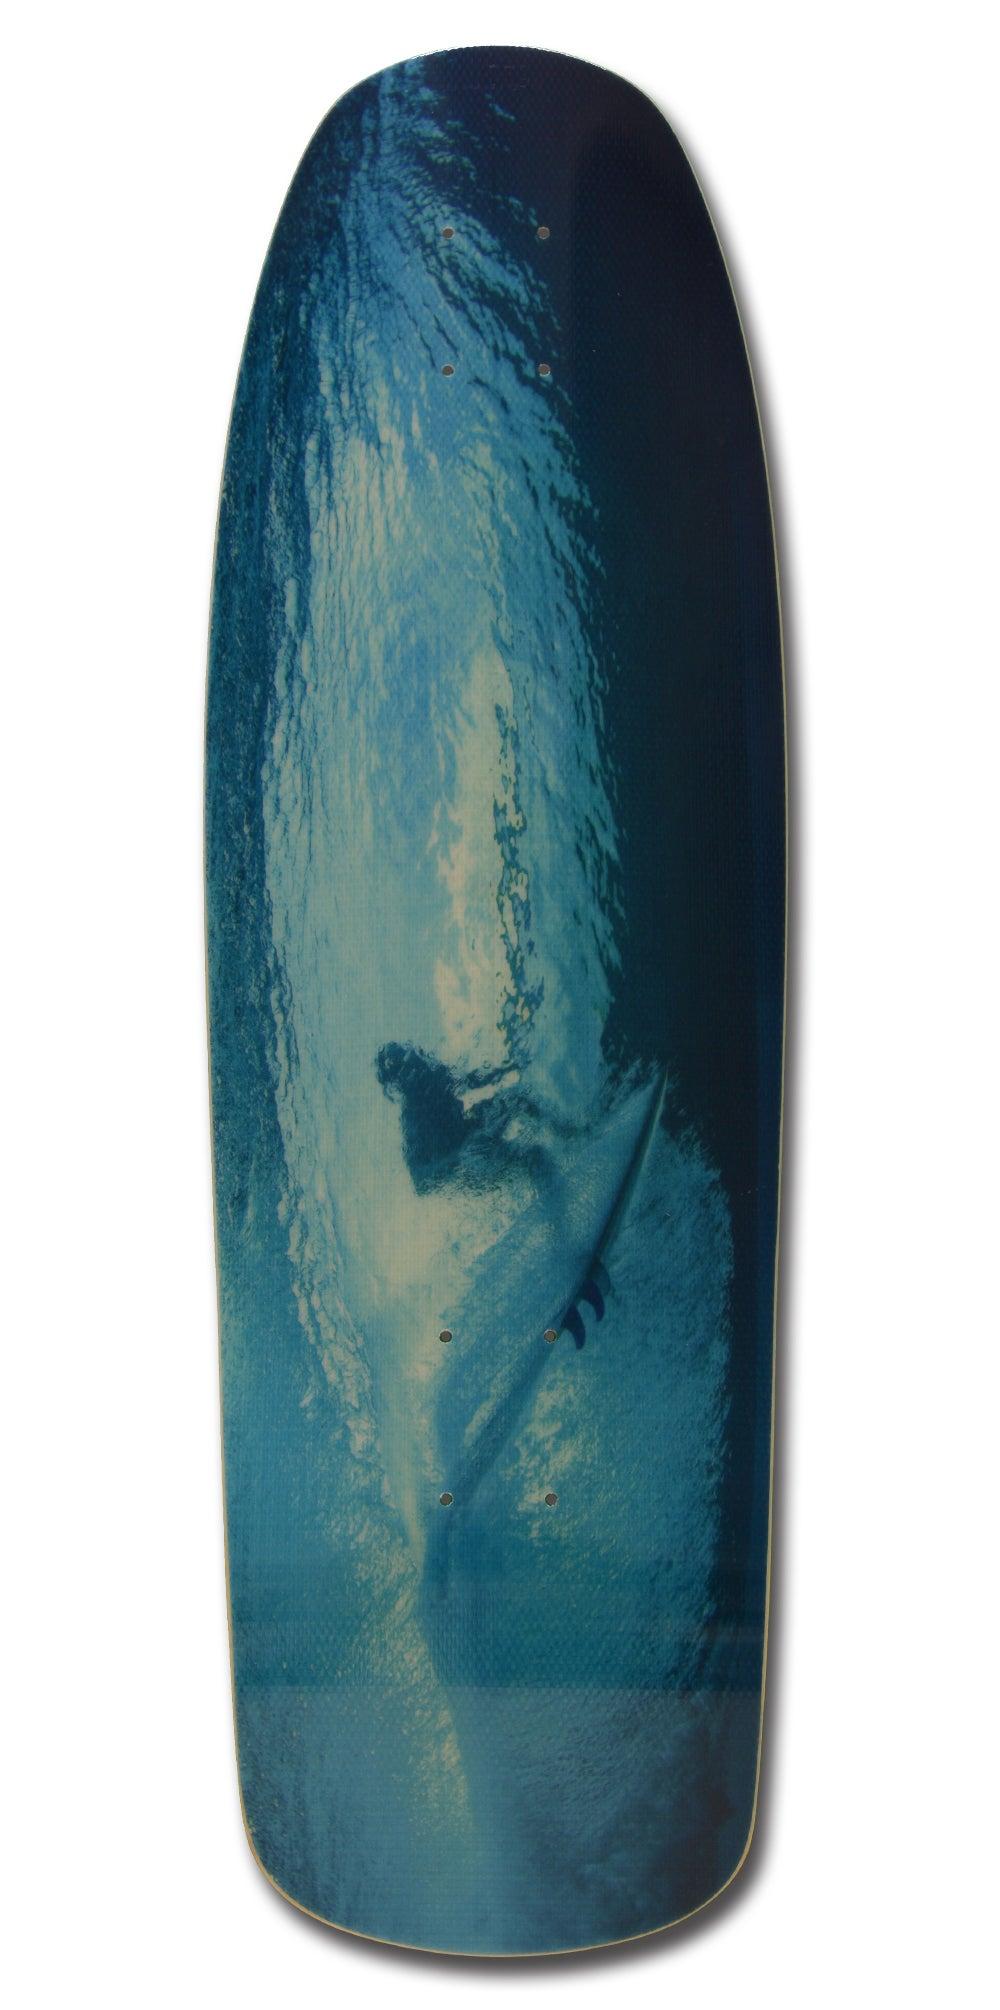 Image of DEEP BLUE